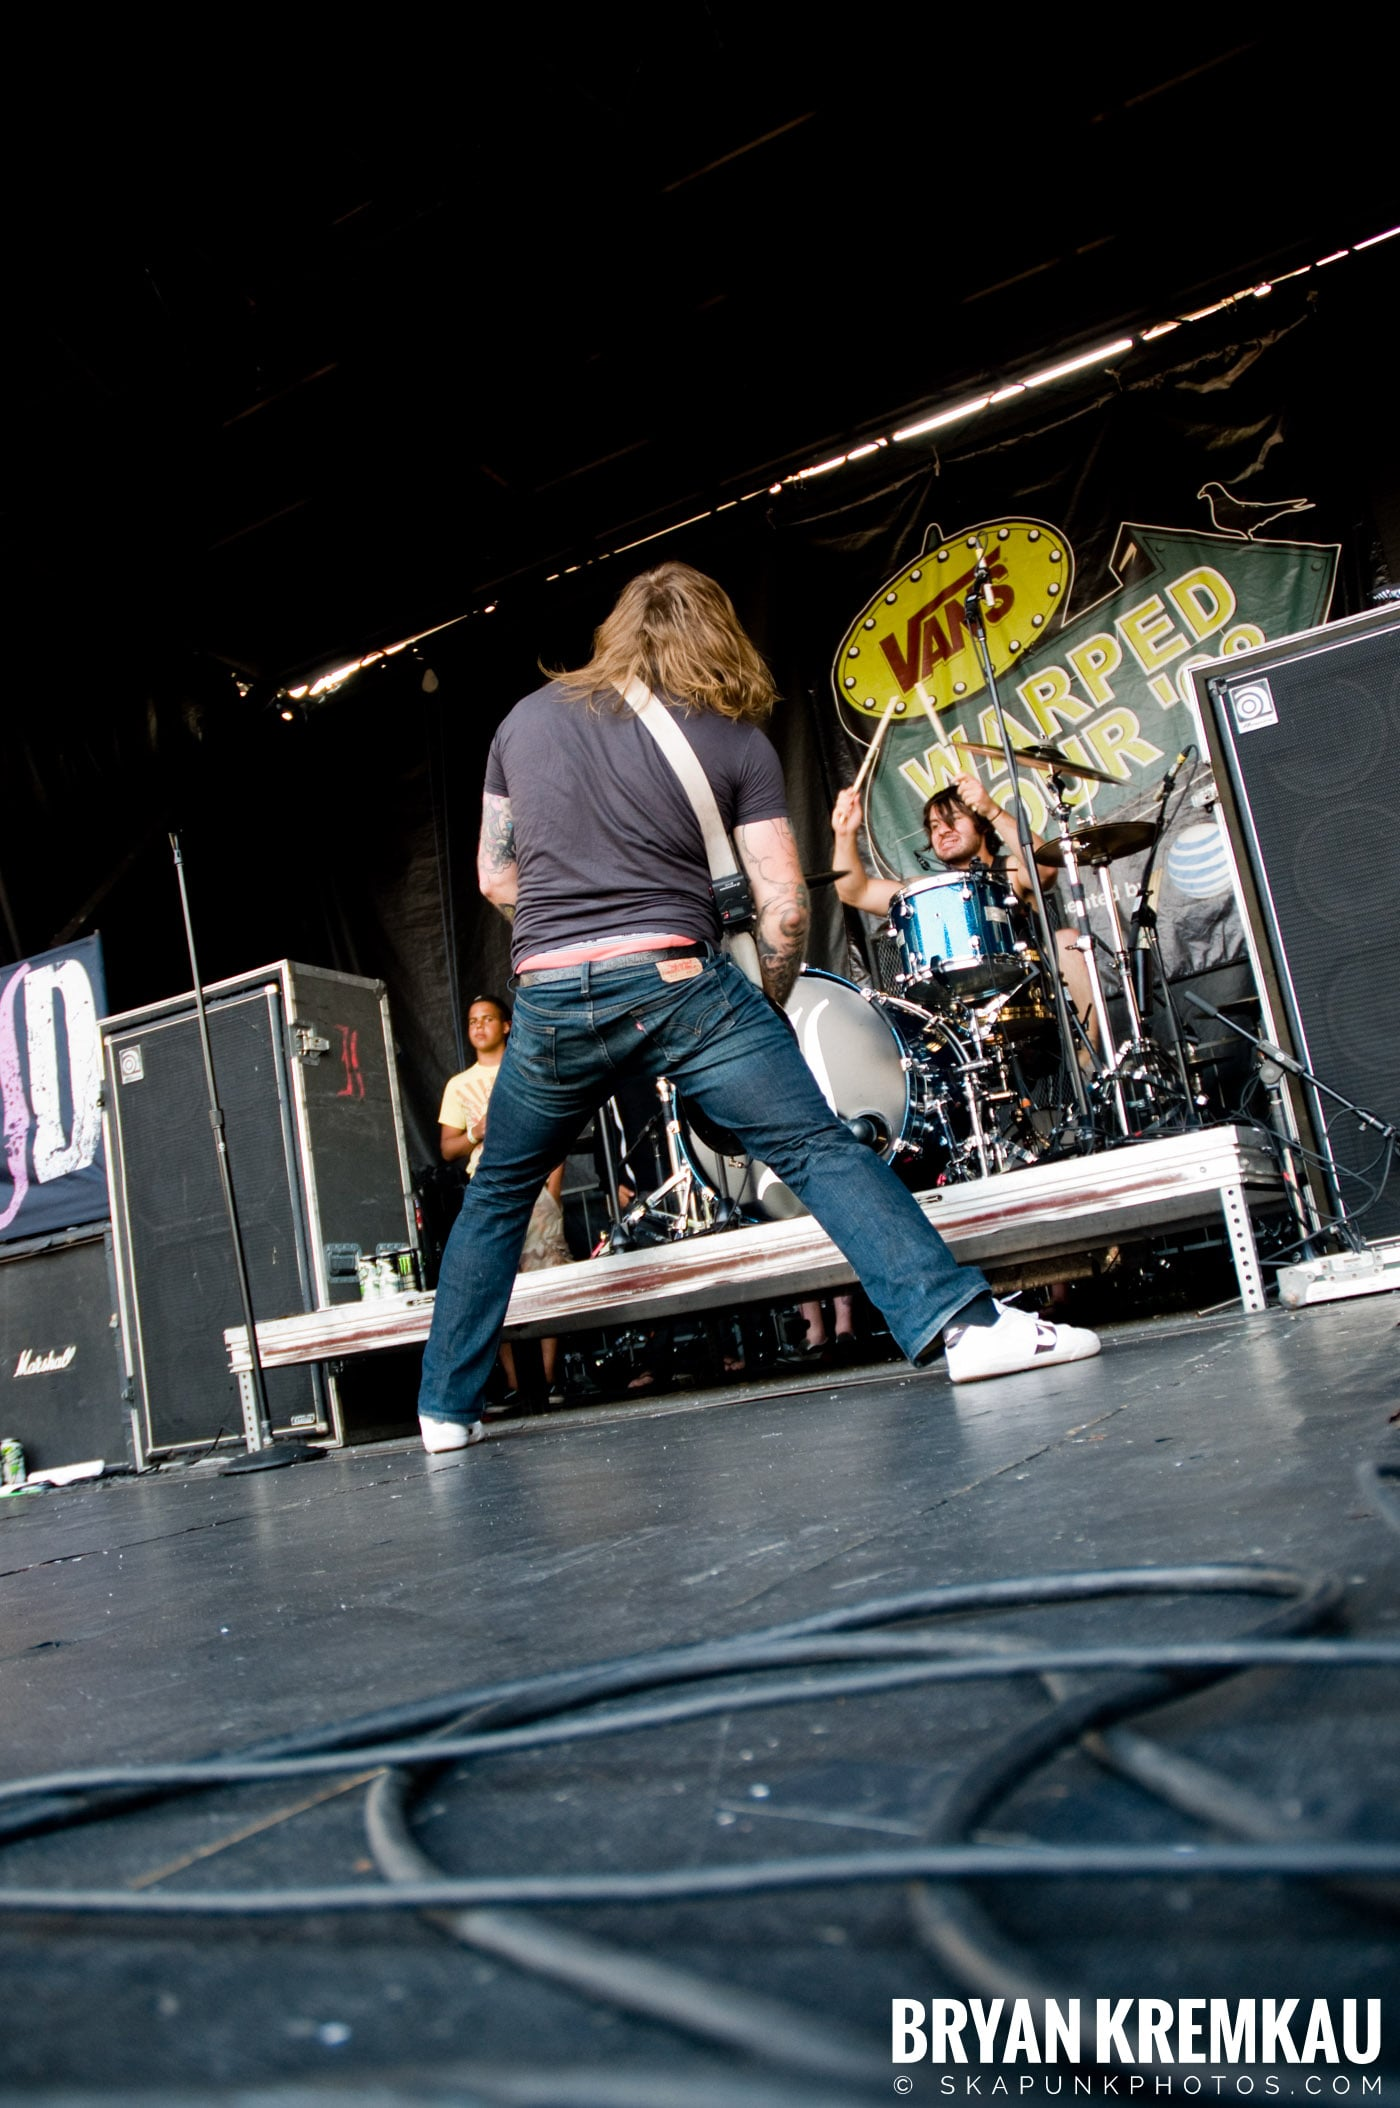 Everytime I Die @ Warped Tour 08, Scranton PA - 7.27.08 (13)